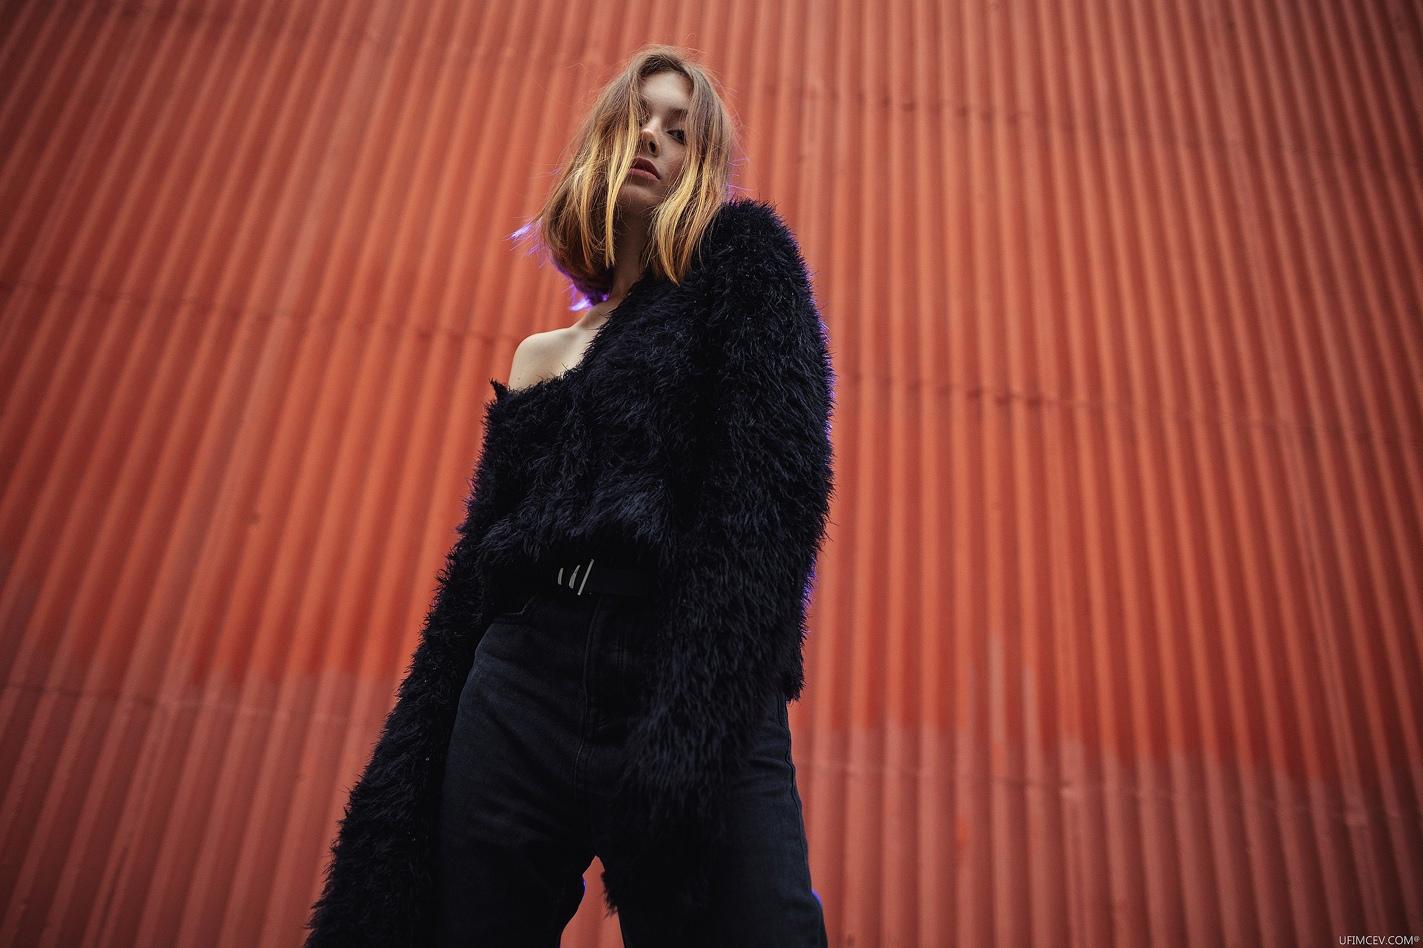 https://www.youngfolks.ru/pub/photographer-aleksandr-ufimtsev-model-anna-grigoryeva